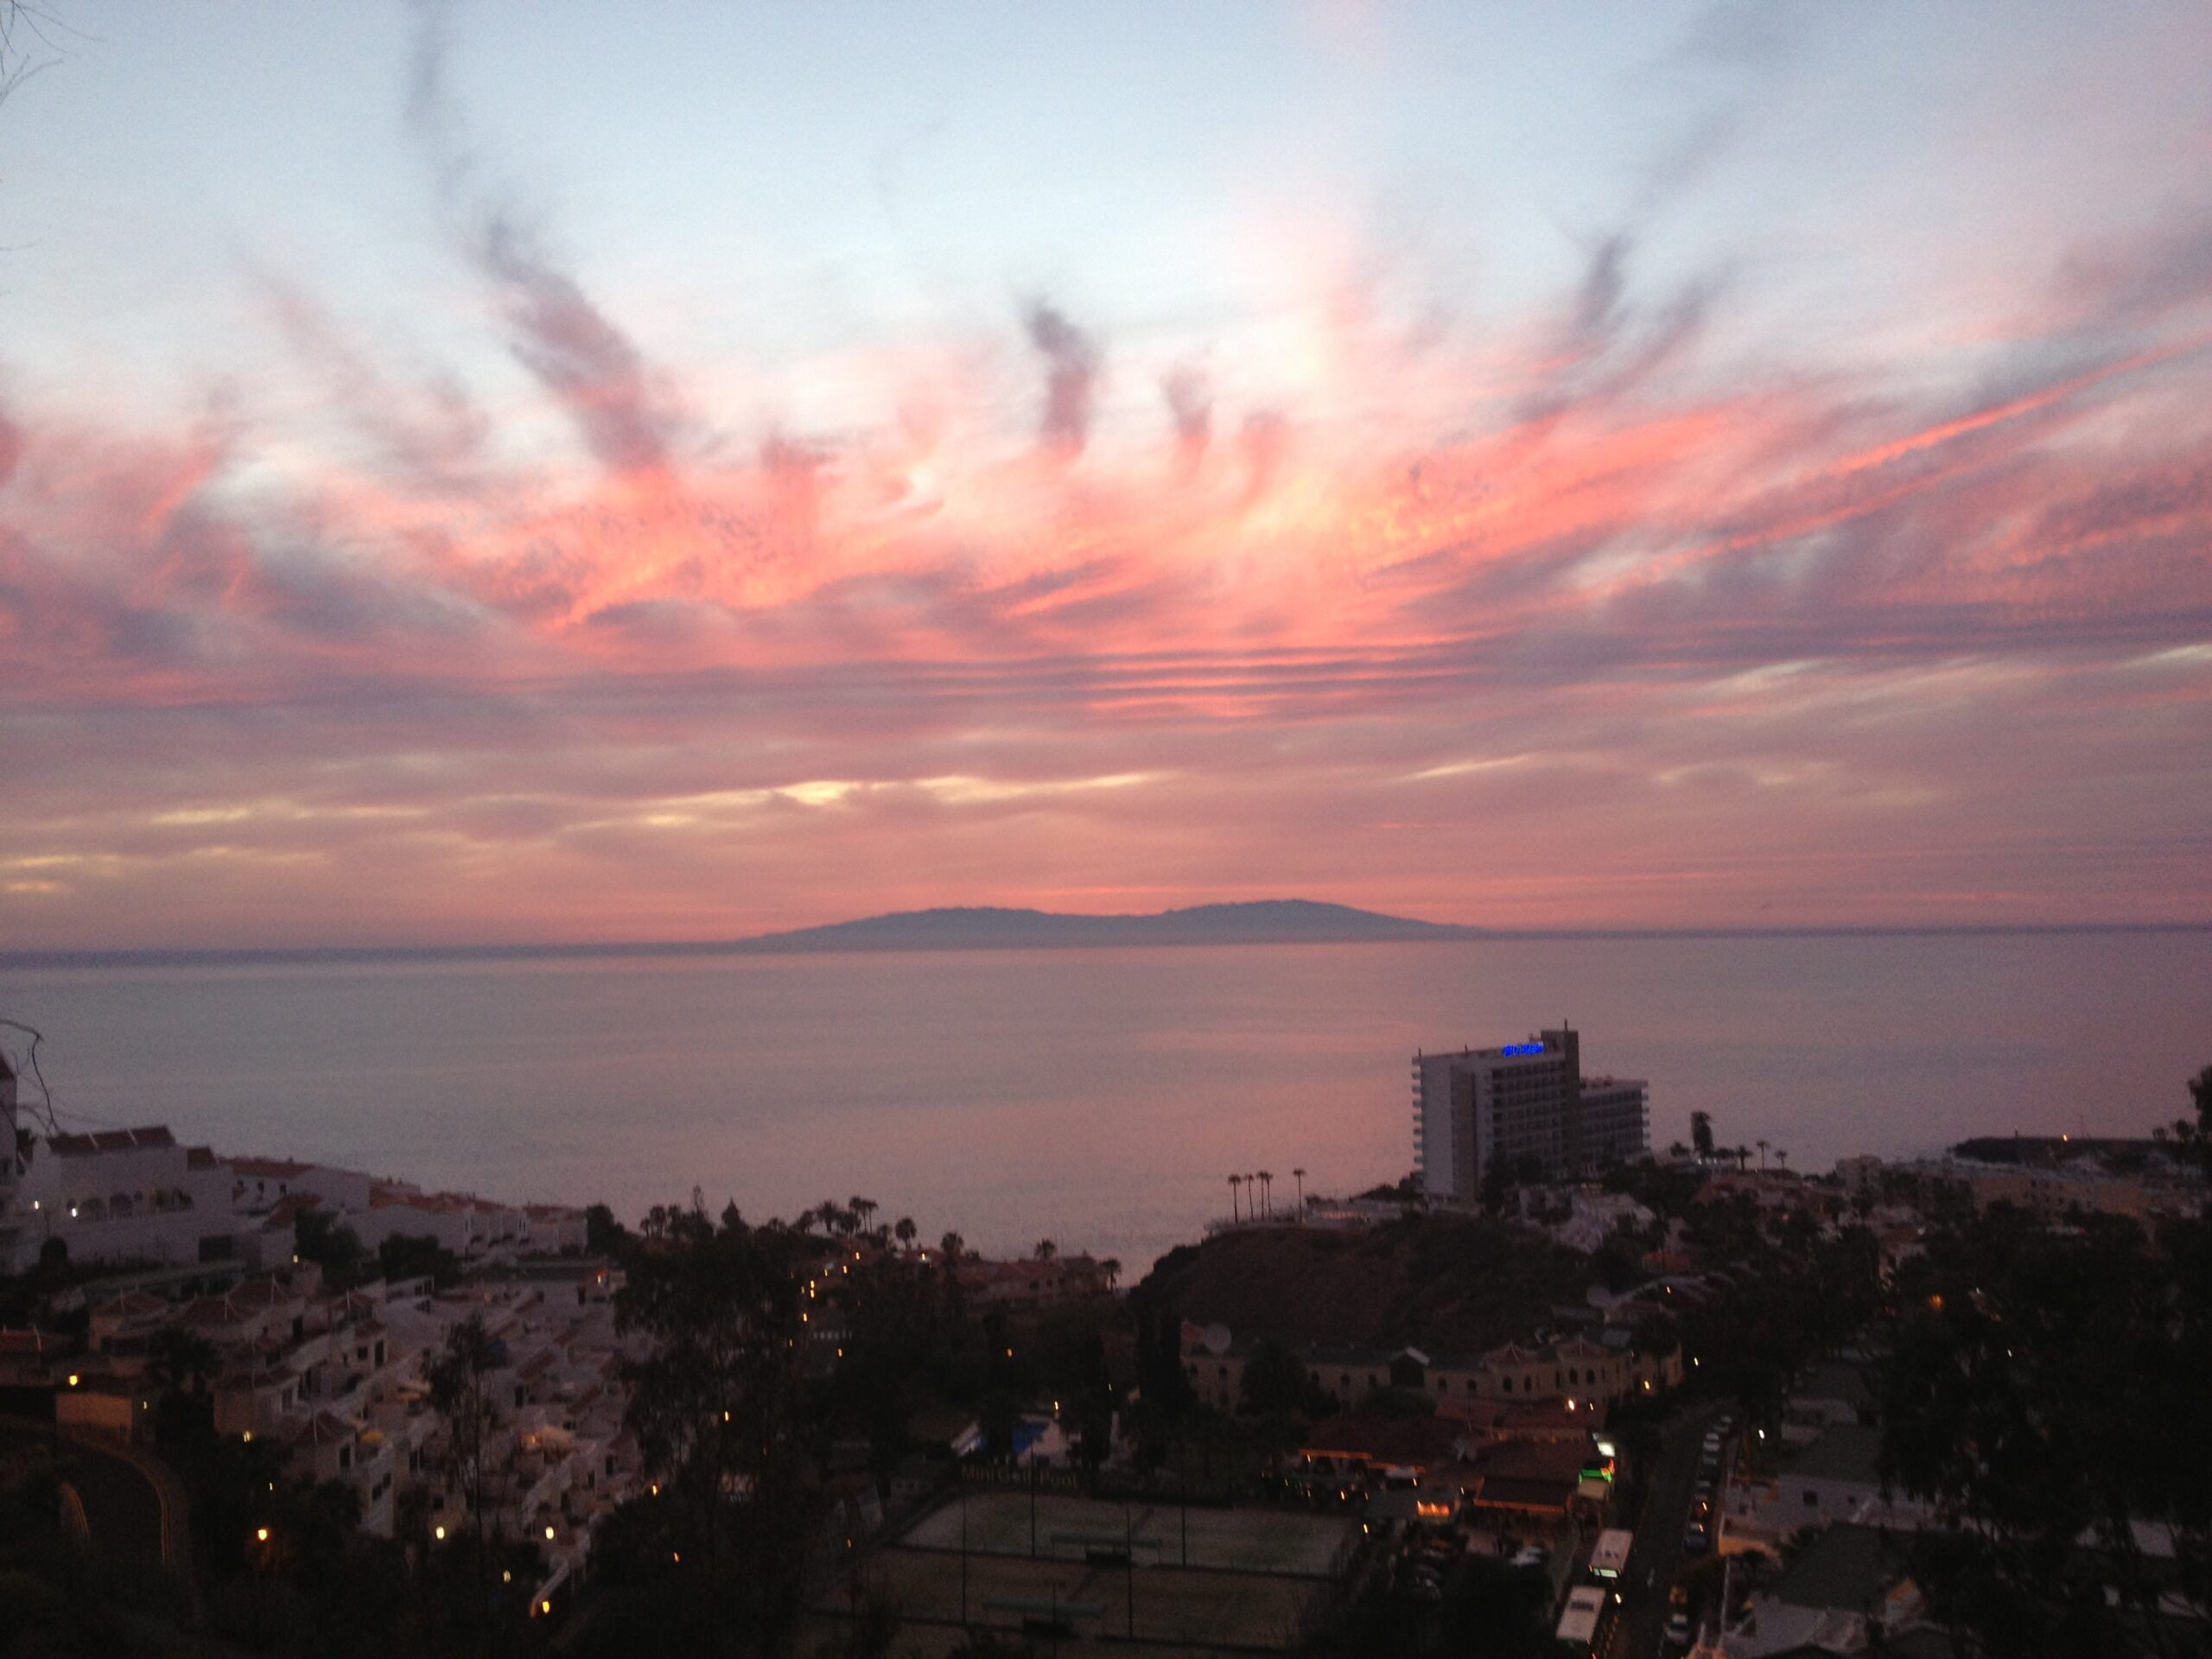 Юго-Запад Тенерифе: Плая-де-ла-Арена и Лос-Гигантес